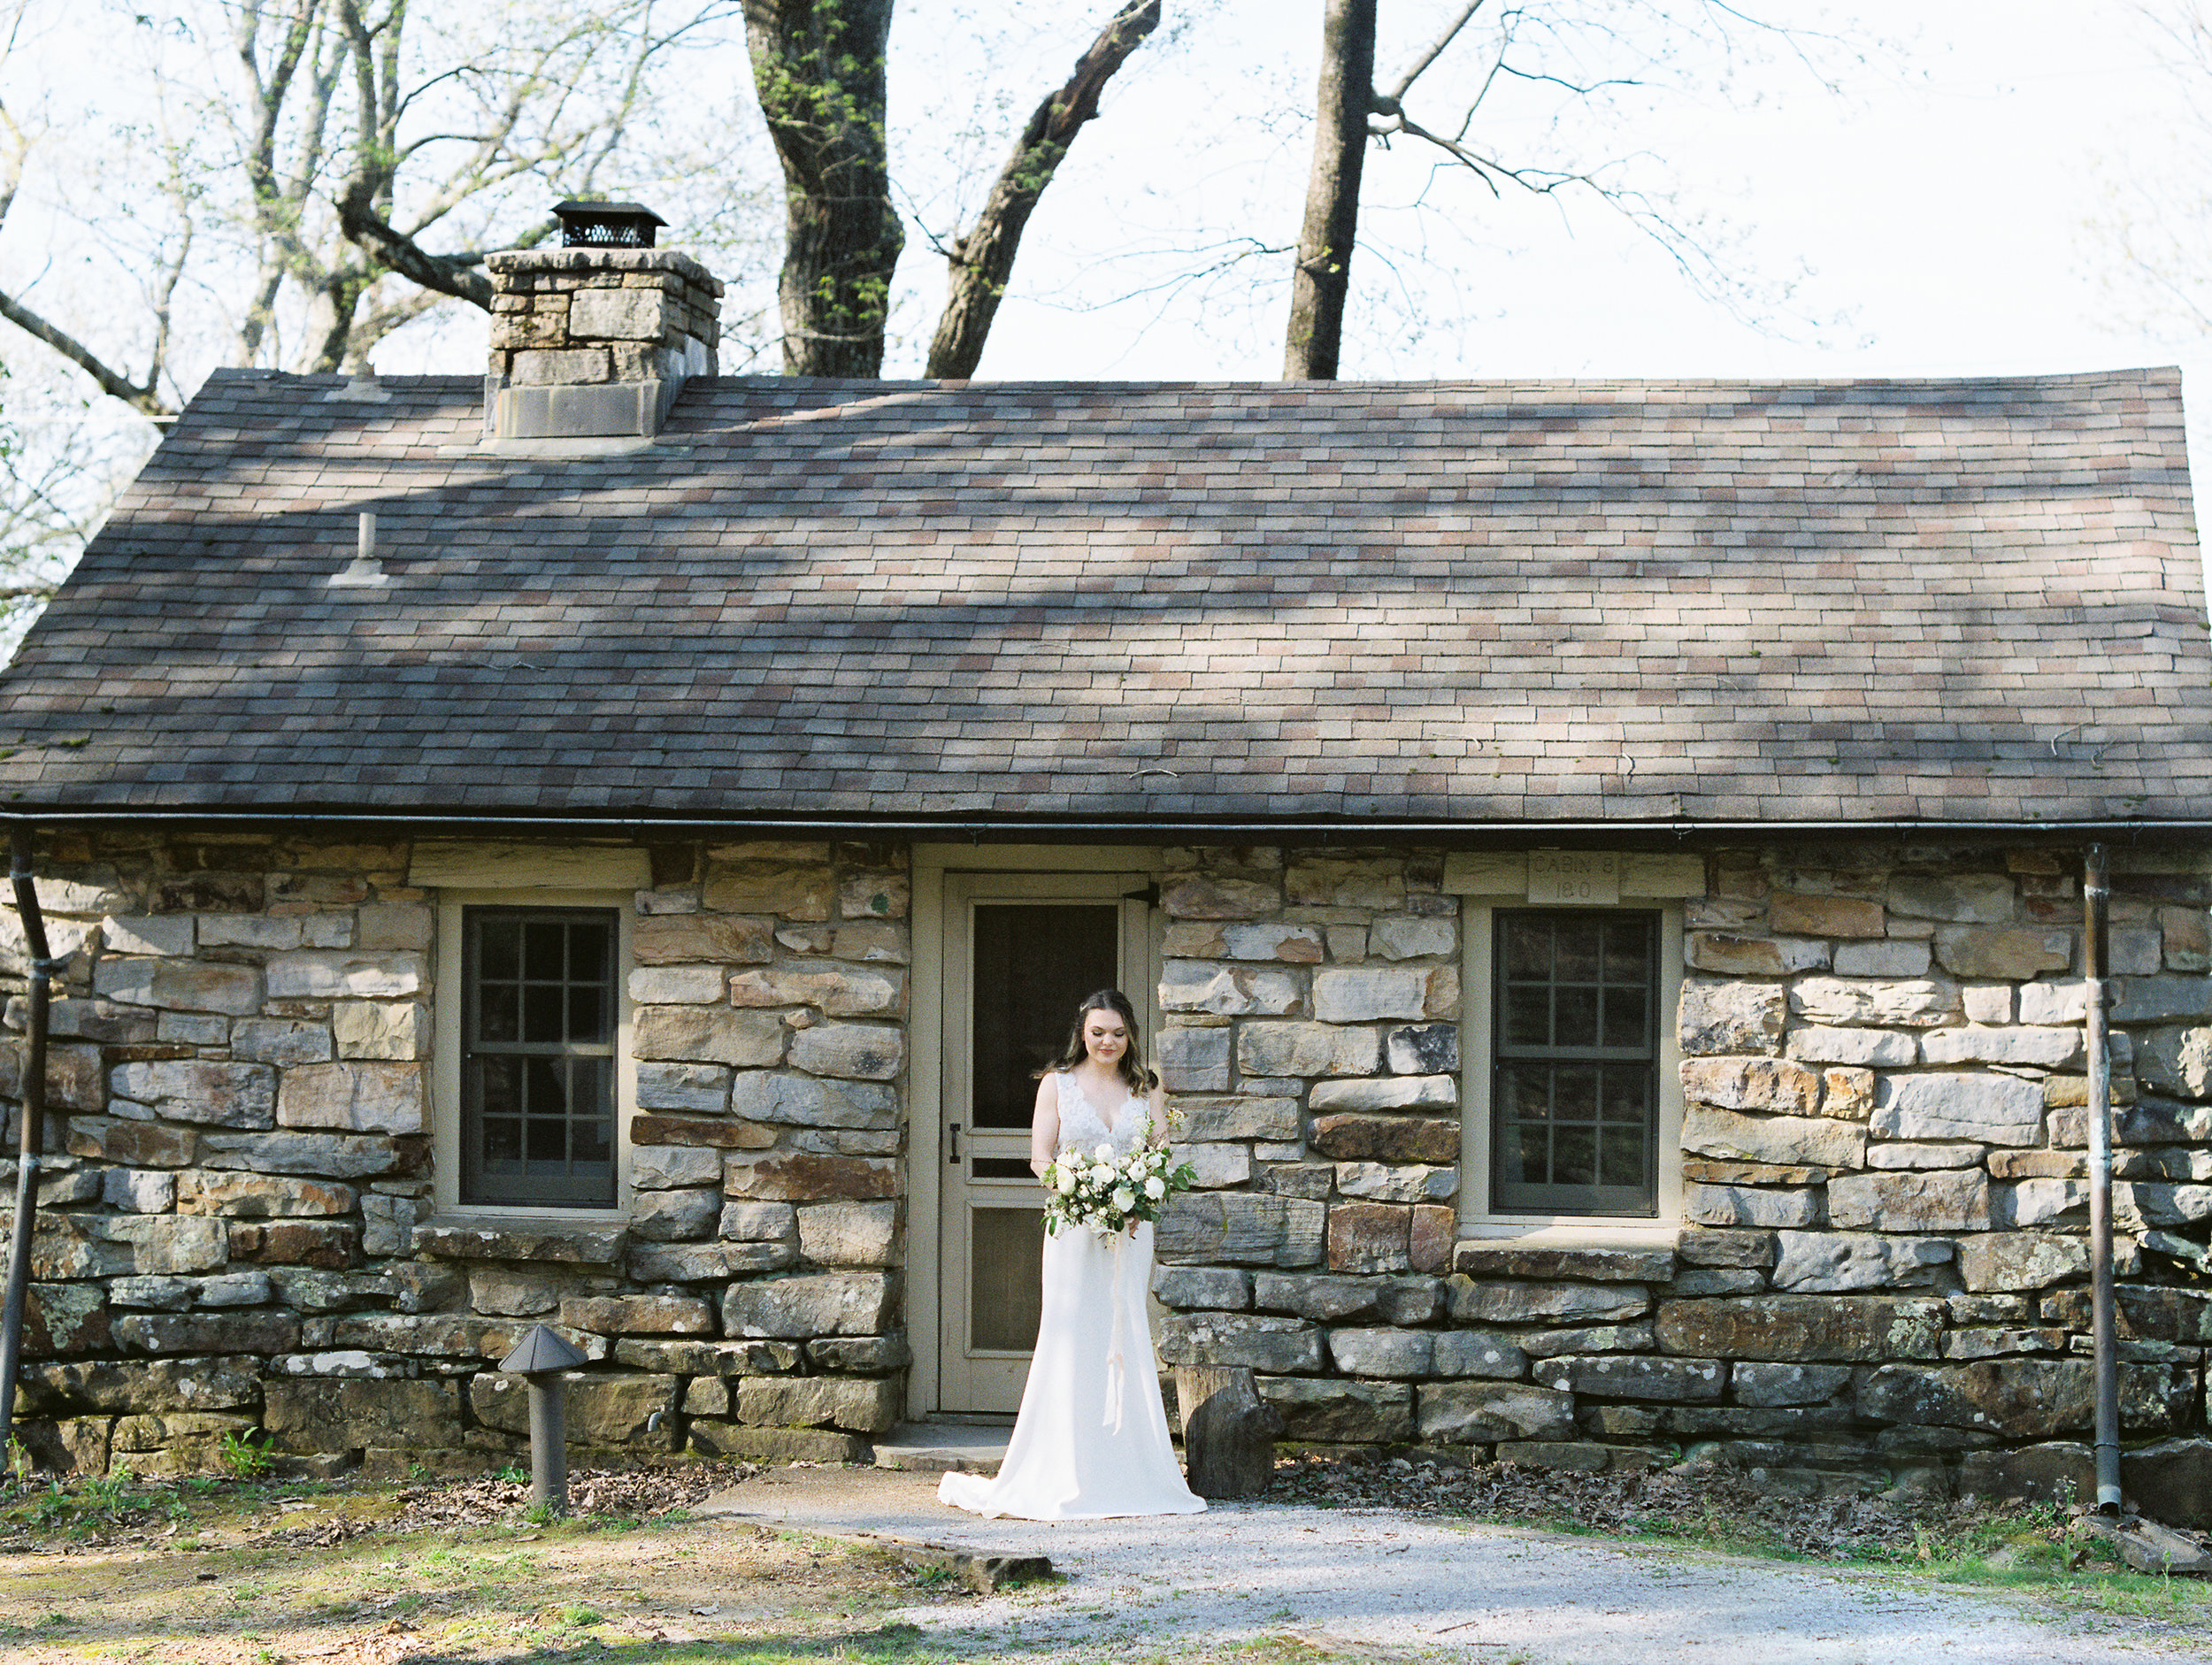 Huntsville-Alabama-Elopement-Intimate-Wedding-Film-Photographer-94.jpg